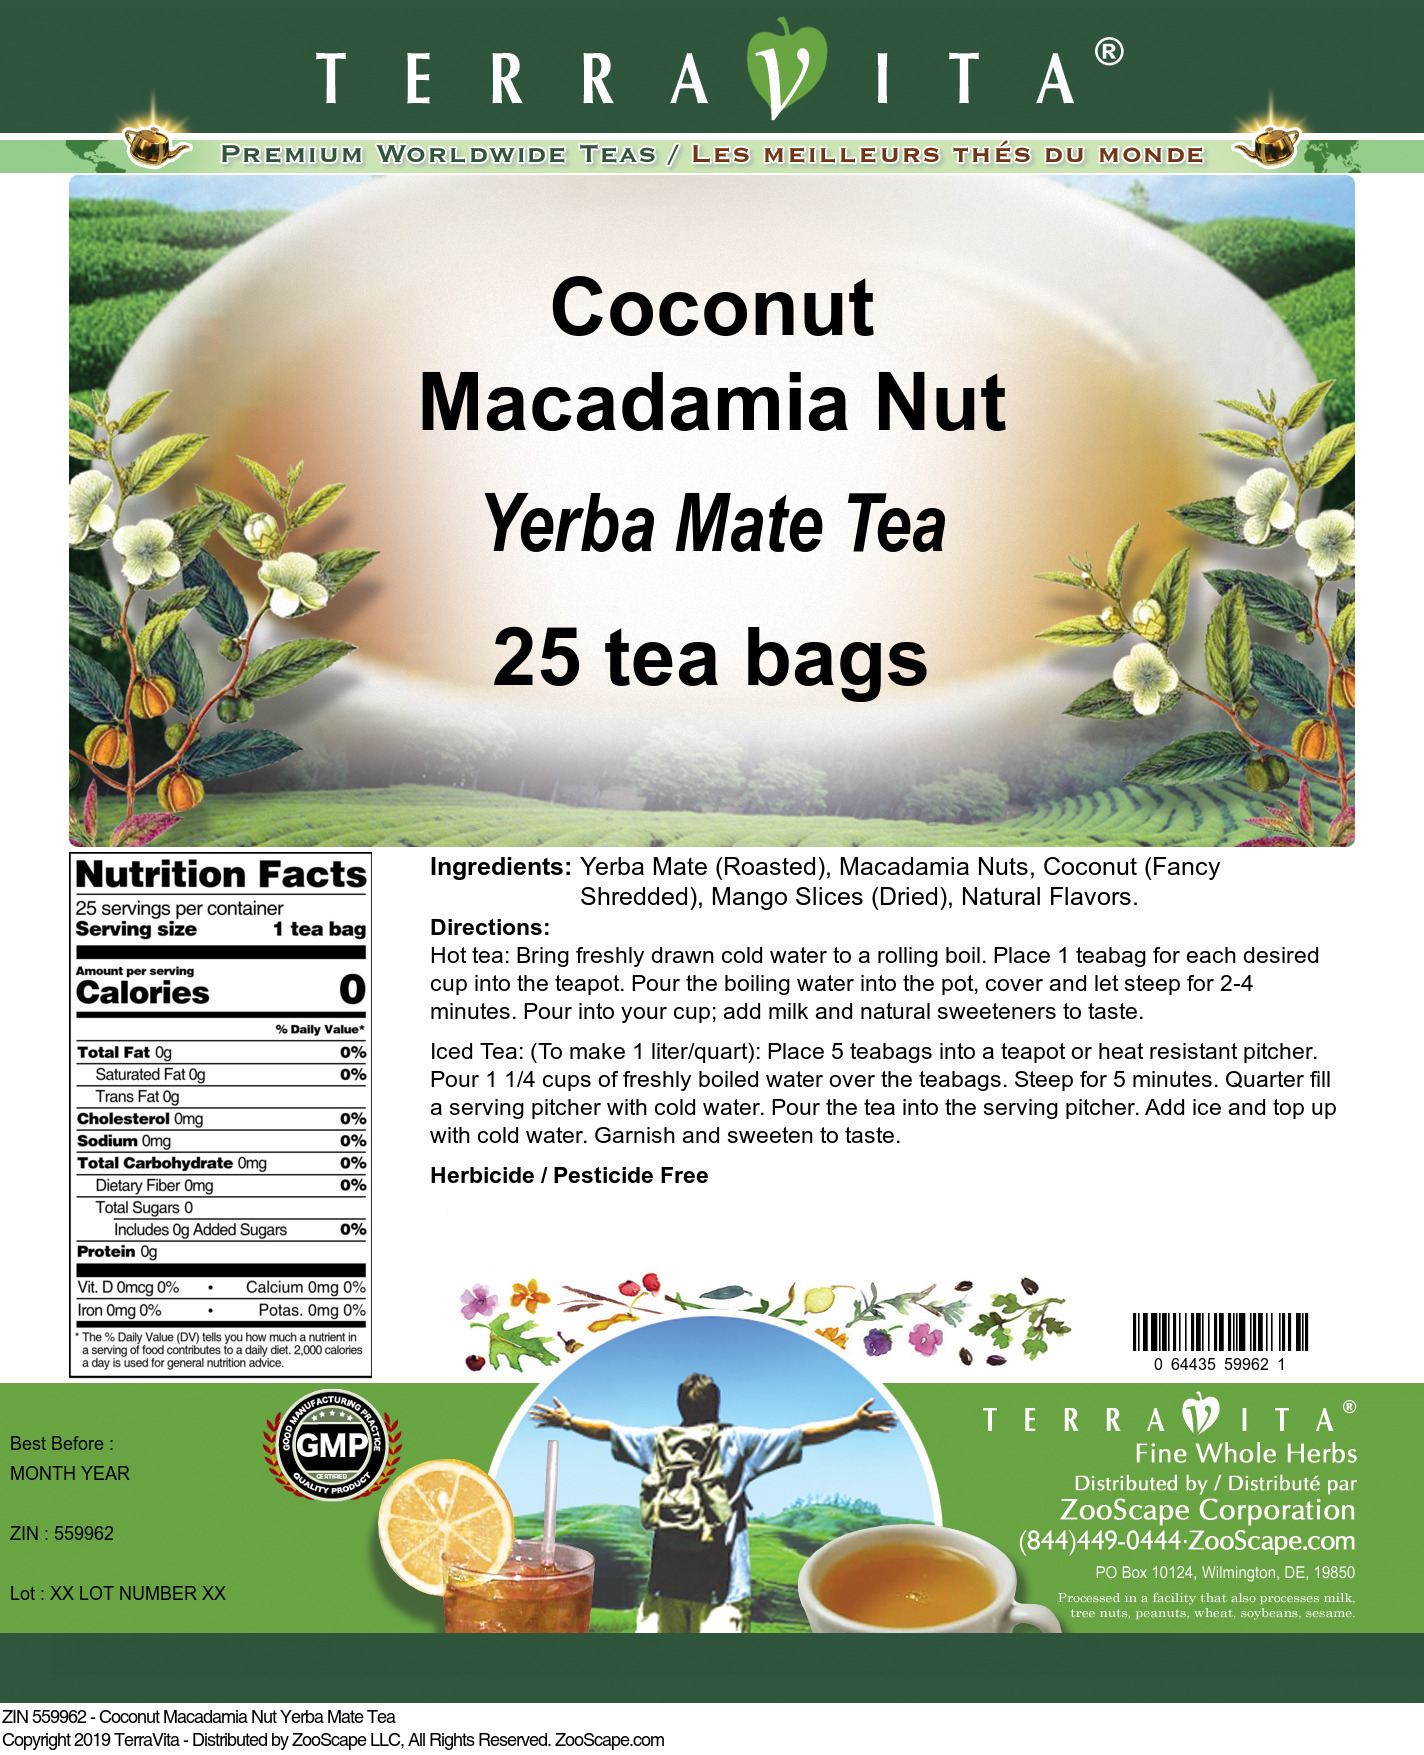 Coconut Macadamia Nut Yerba Mate Tea